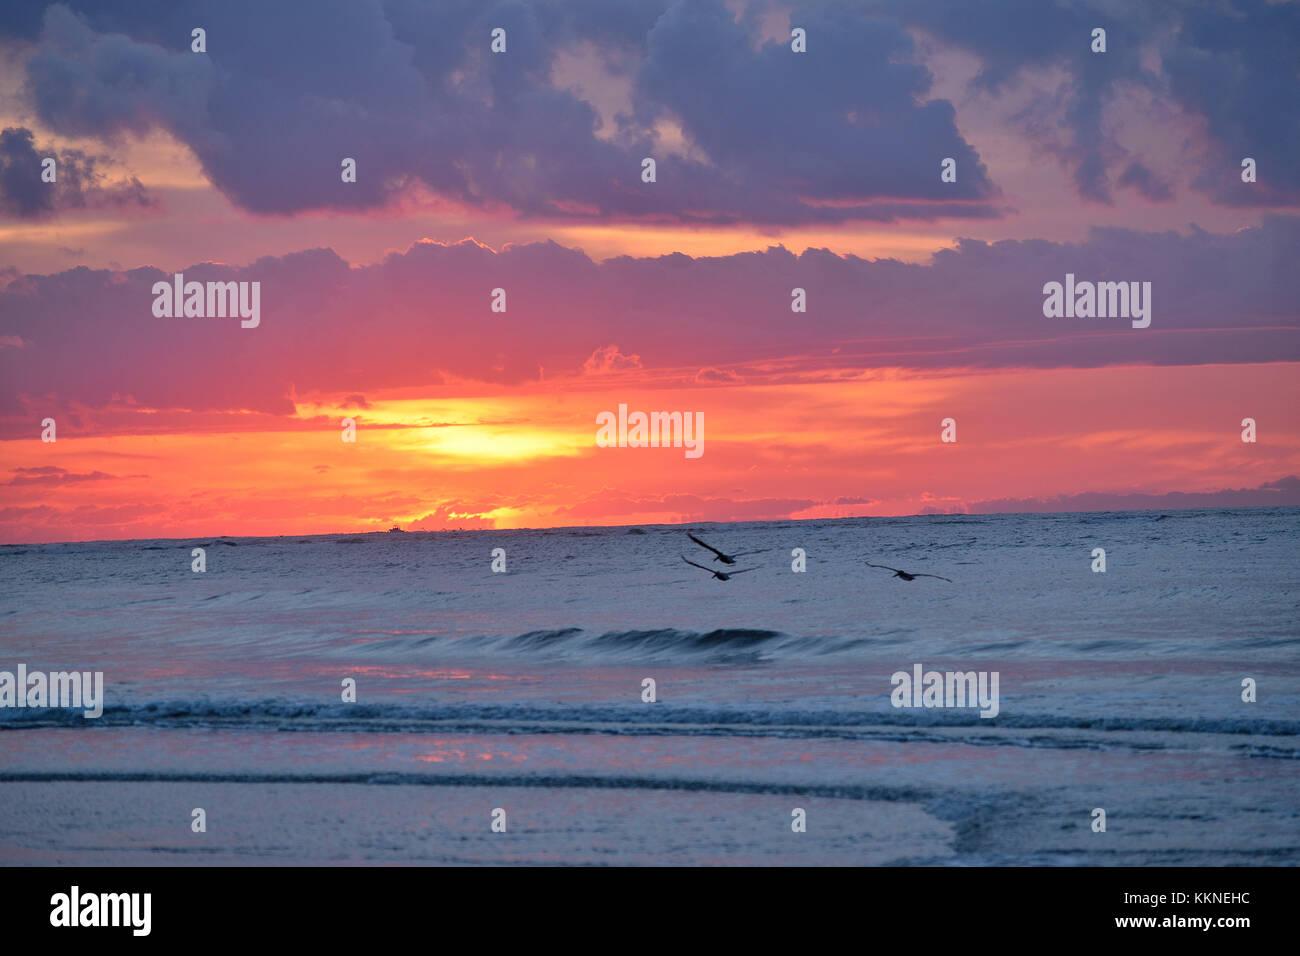 Brillante inspirierenden Sonnenaufgang über dem Meer. Stockbild